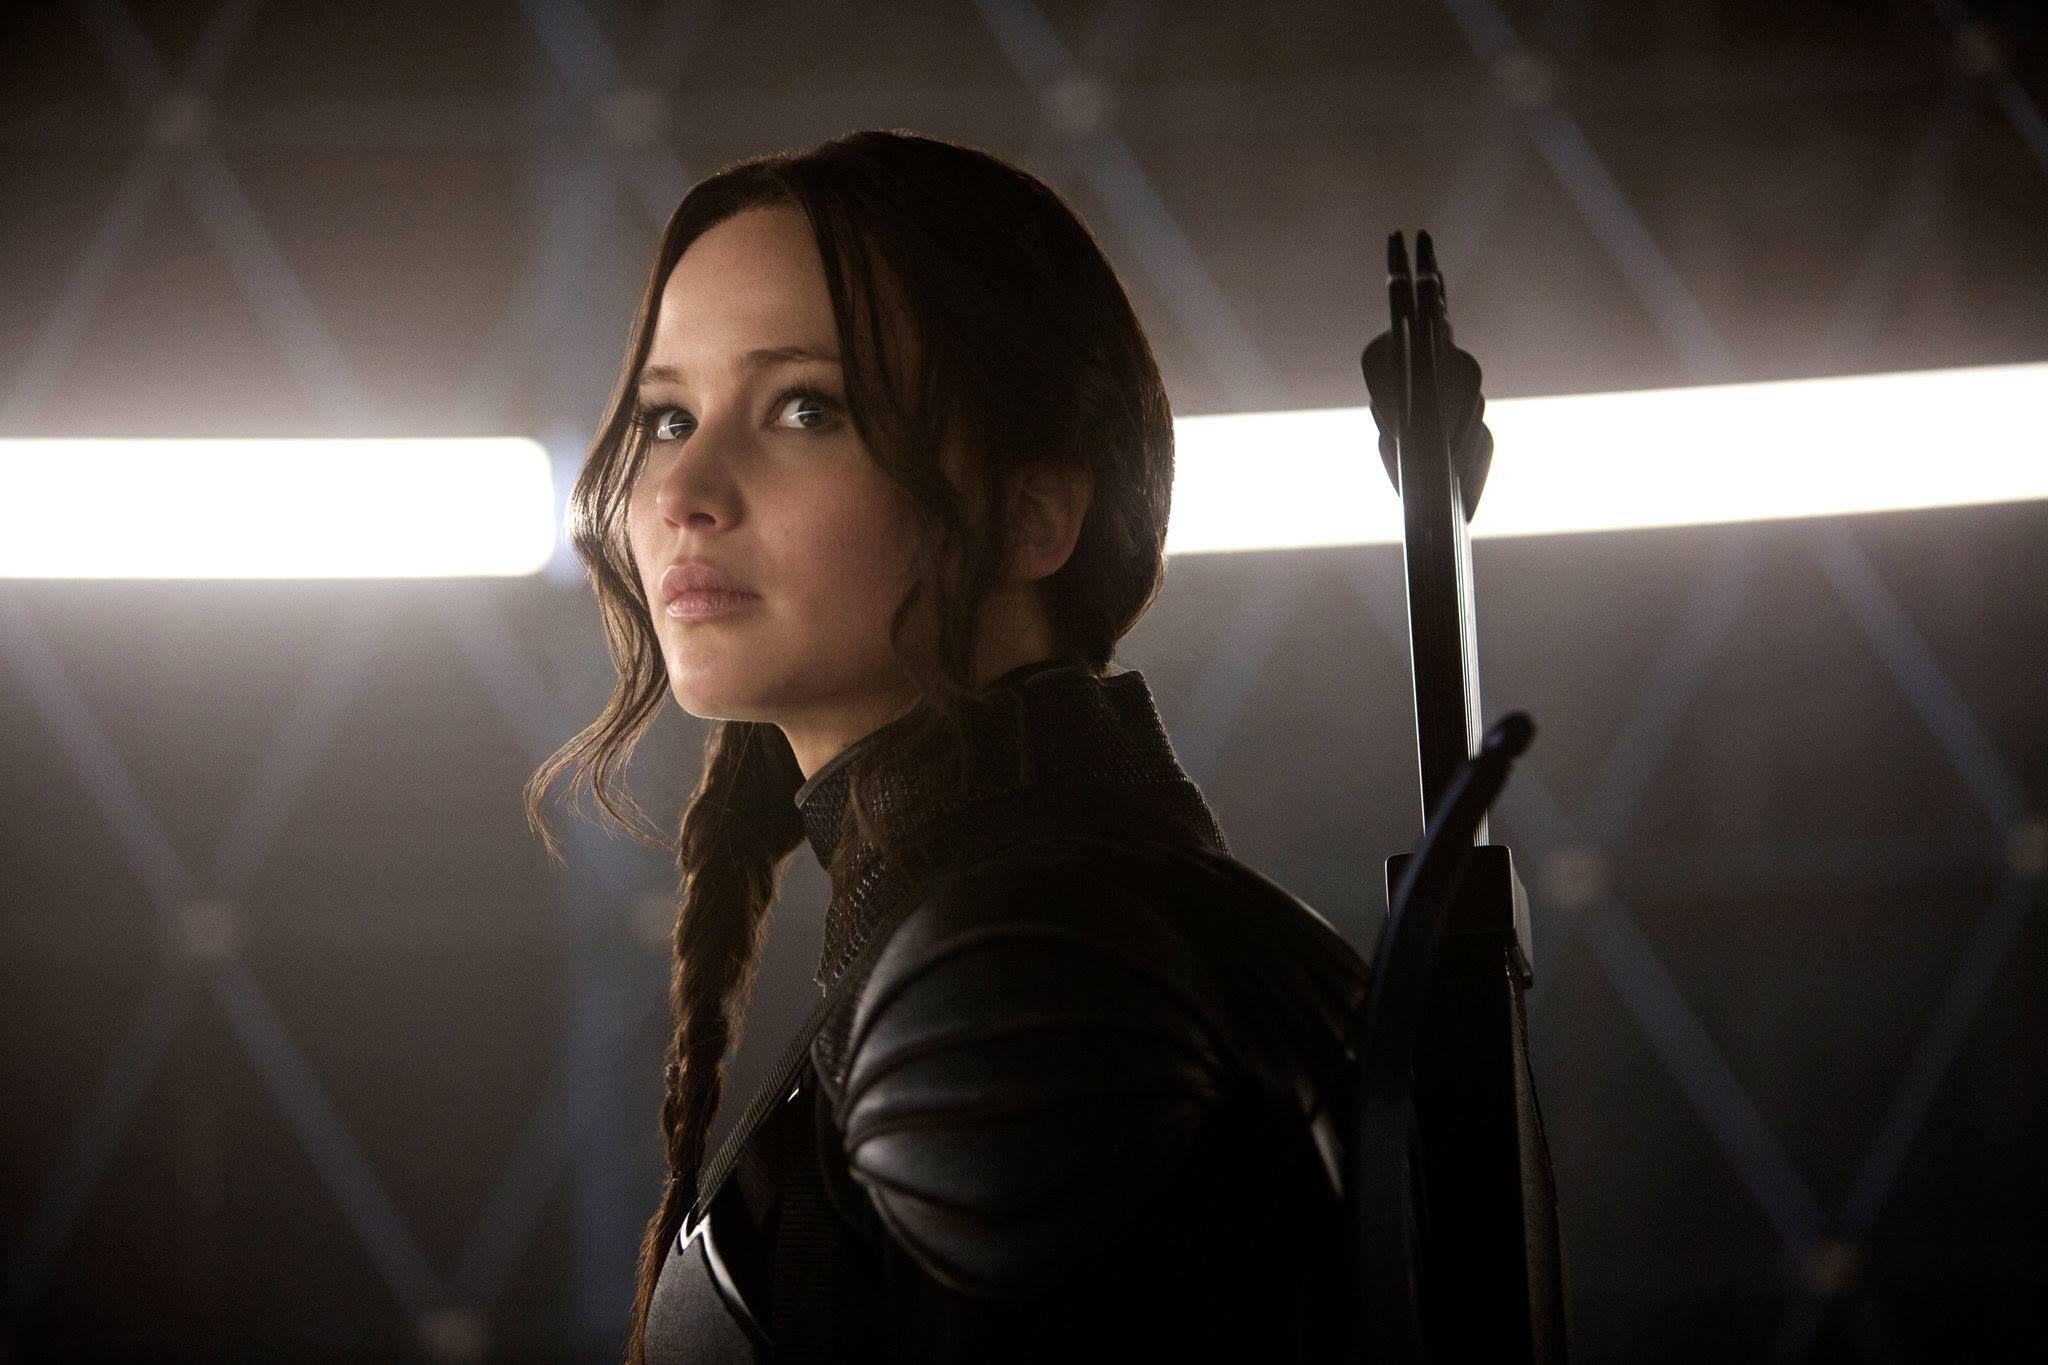 Galaxy J MovieThe Hunger Games Mockingjay Part